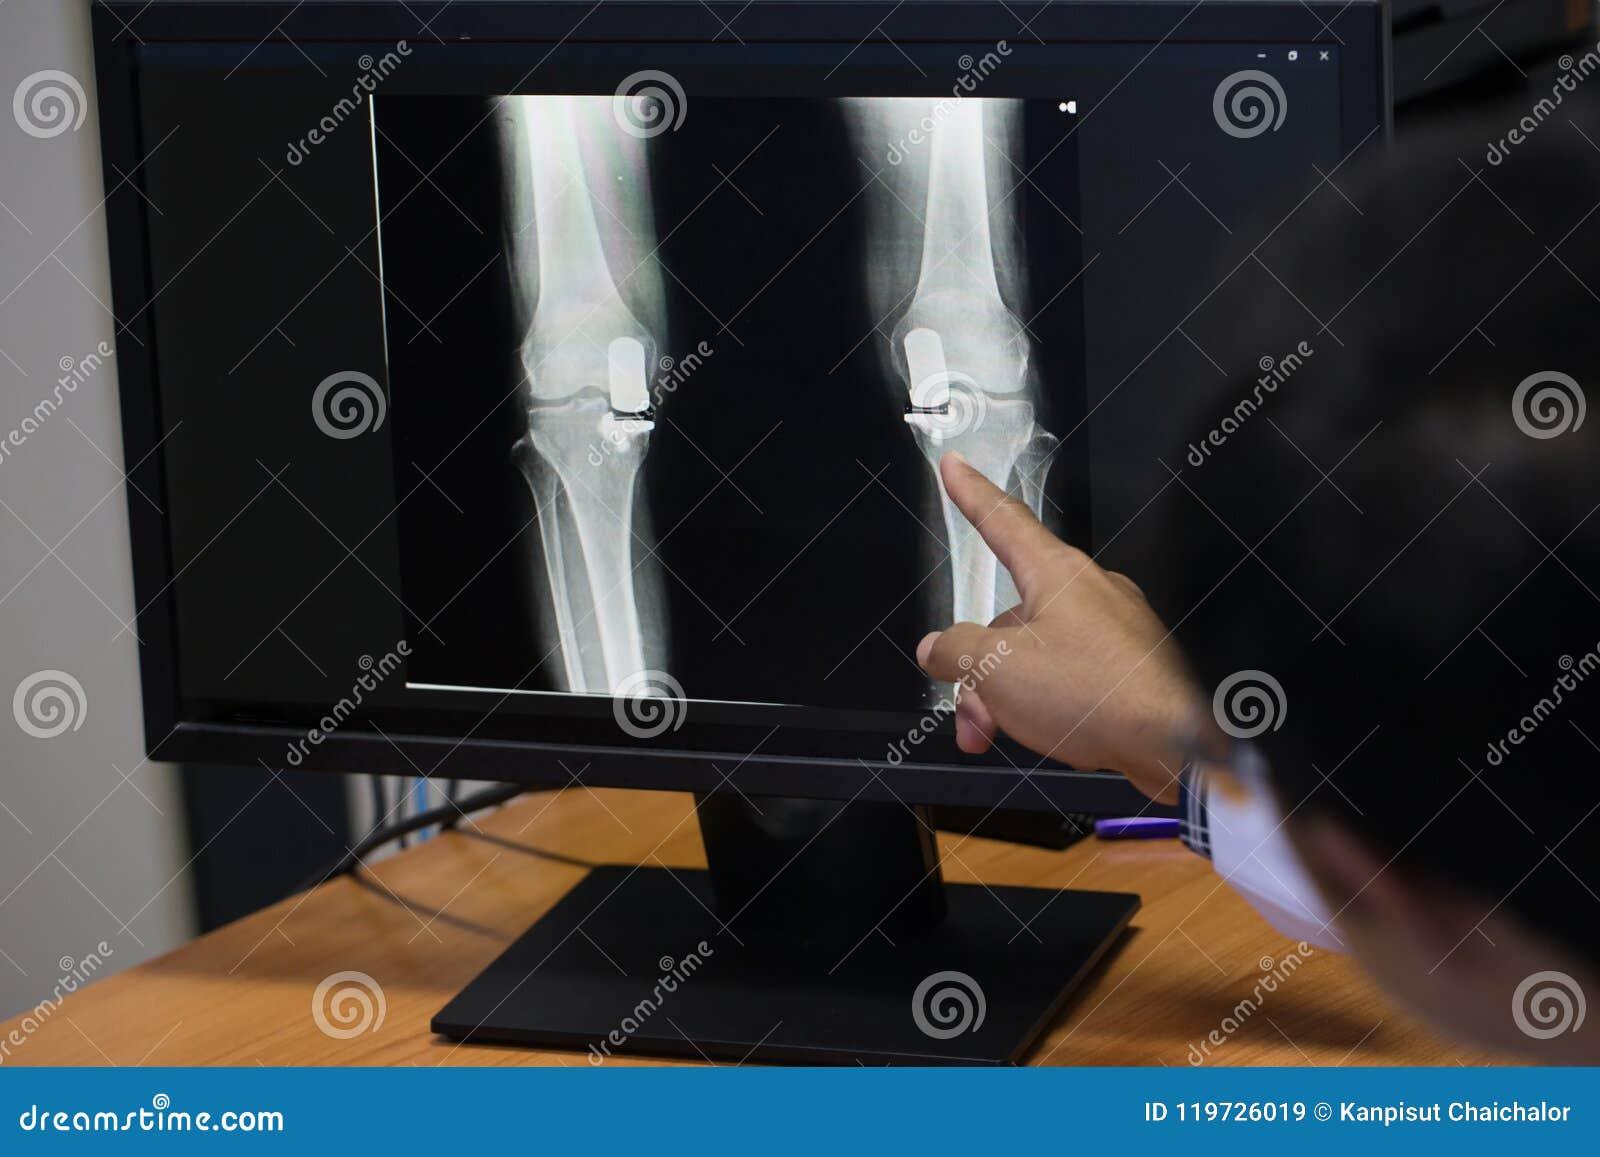 Arts die op het punt van het knieprobleem op x-ray film richten x-ray film toont skeletknie op film